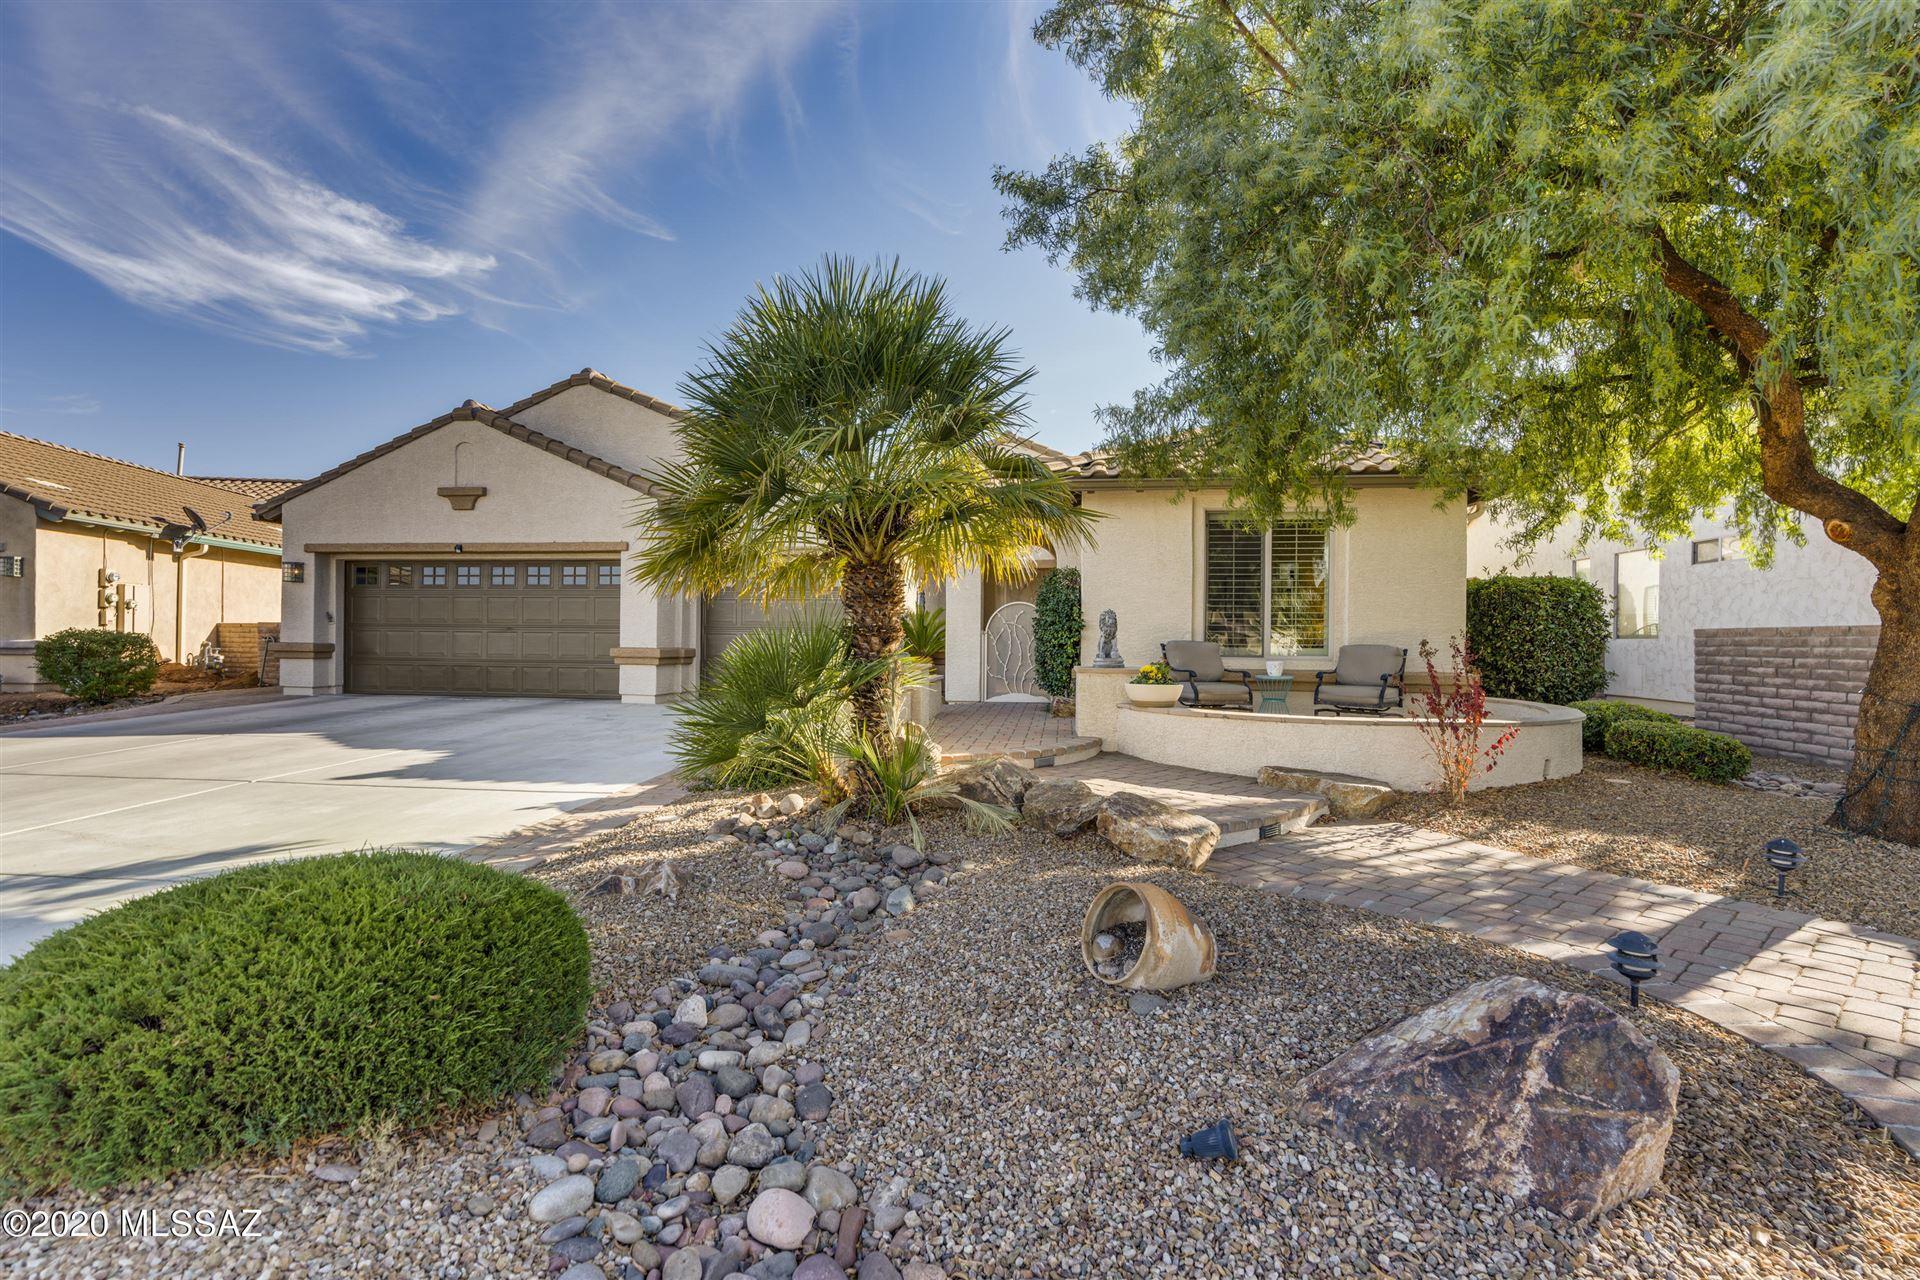 2670 E Genevieve Way, Green Valley, AZ 85614 - MLS#: 22030765